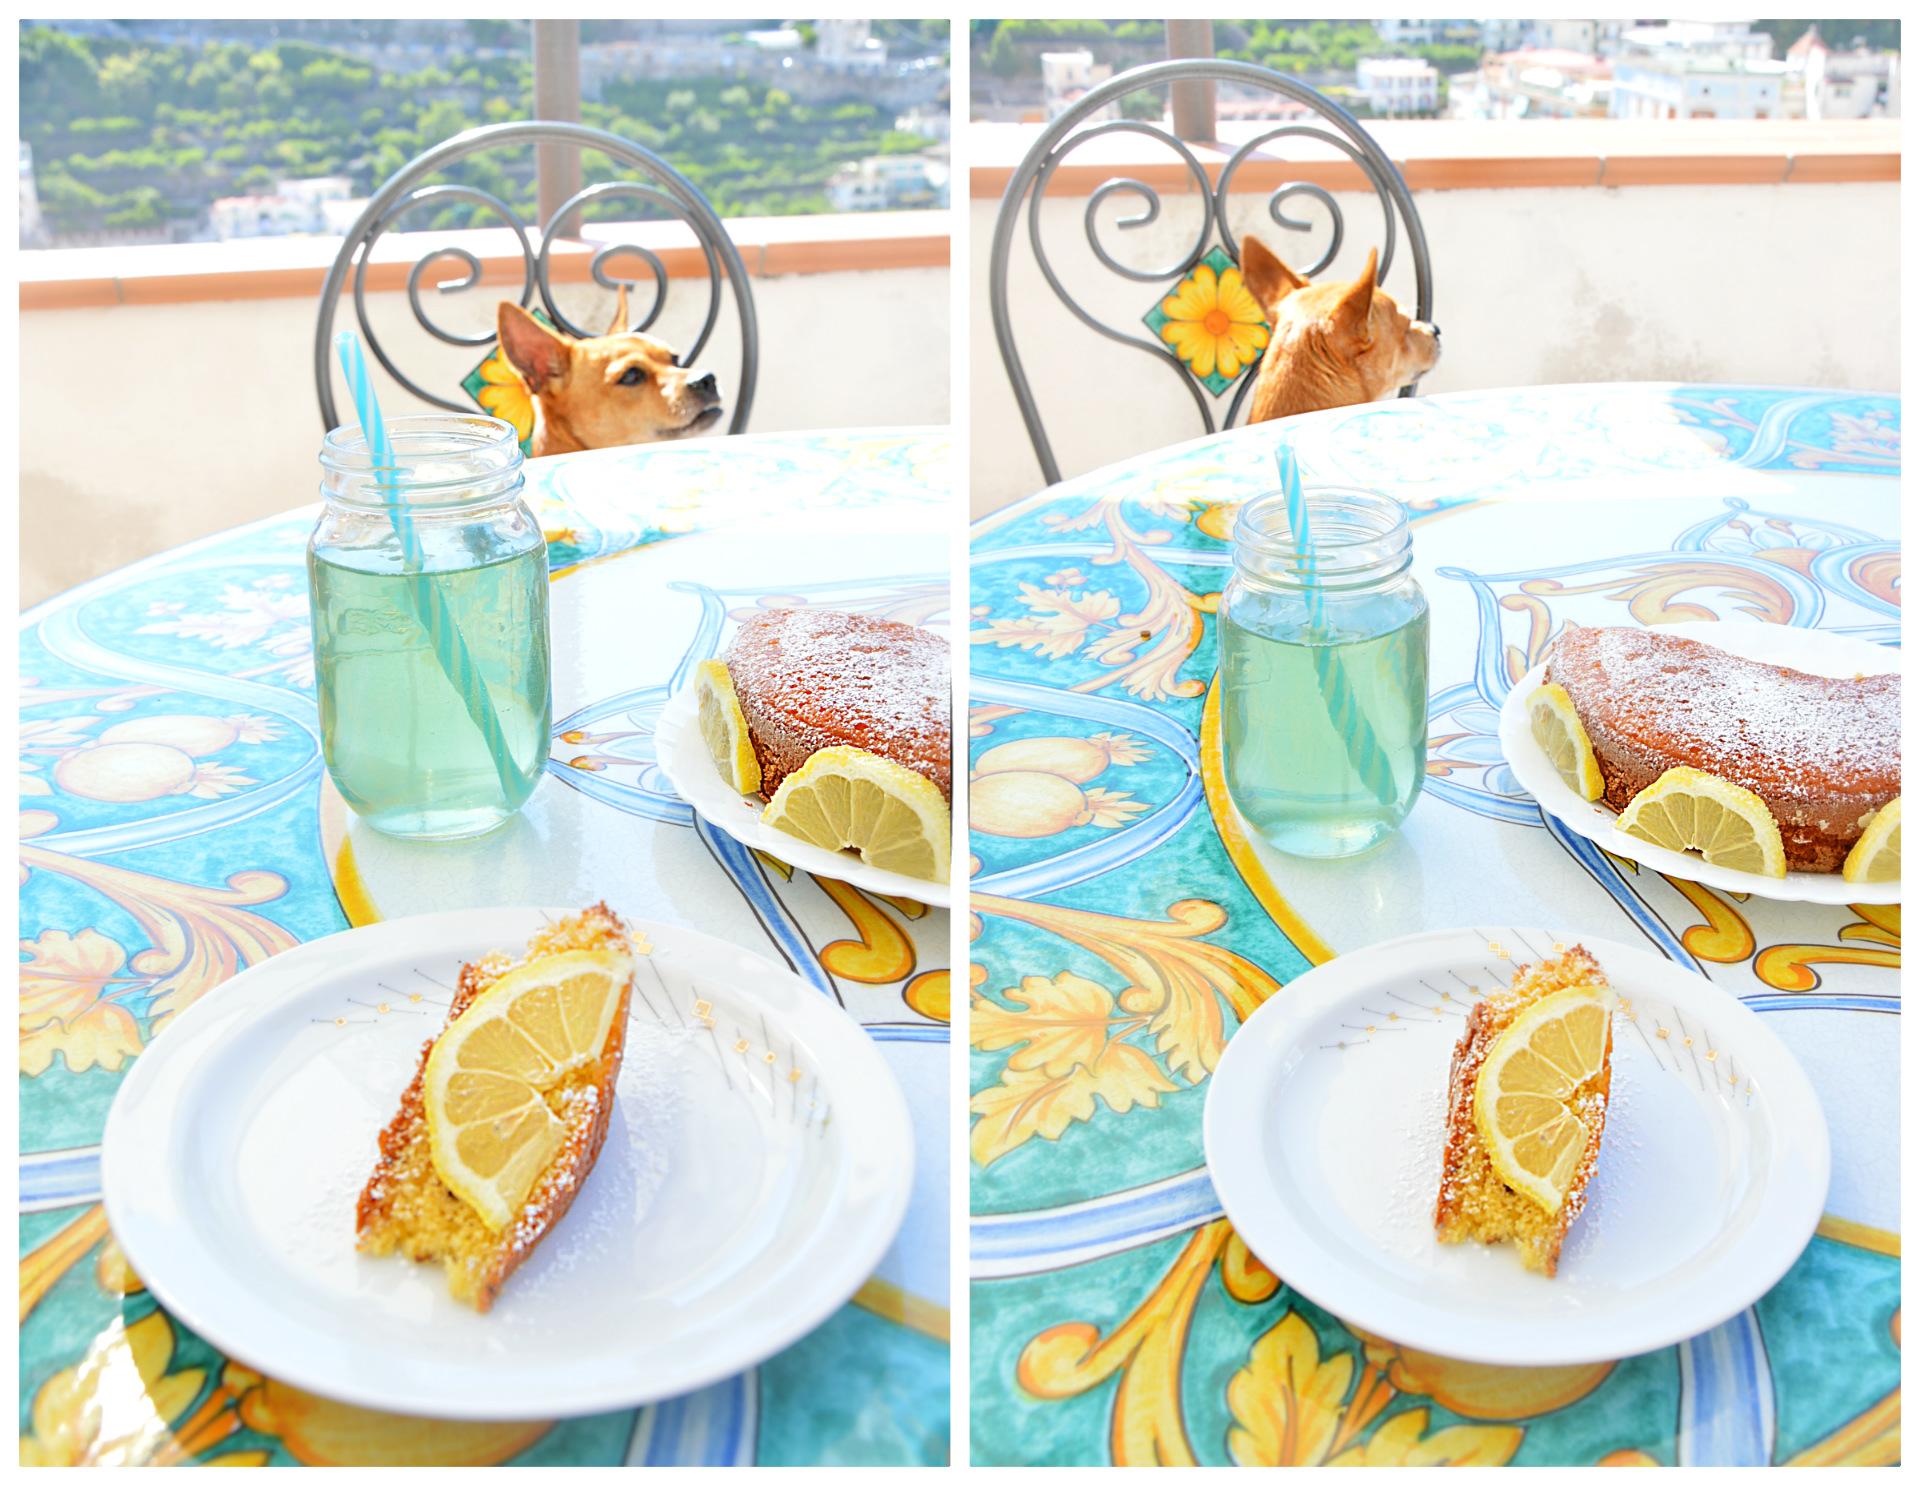 lemon_cake_occhiovunque